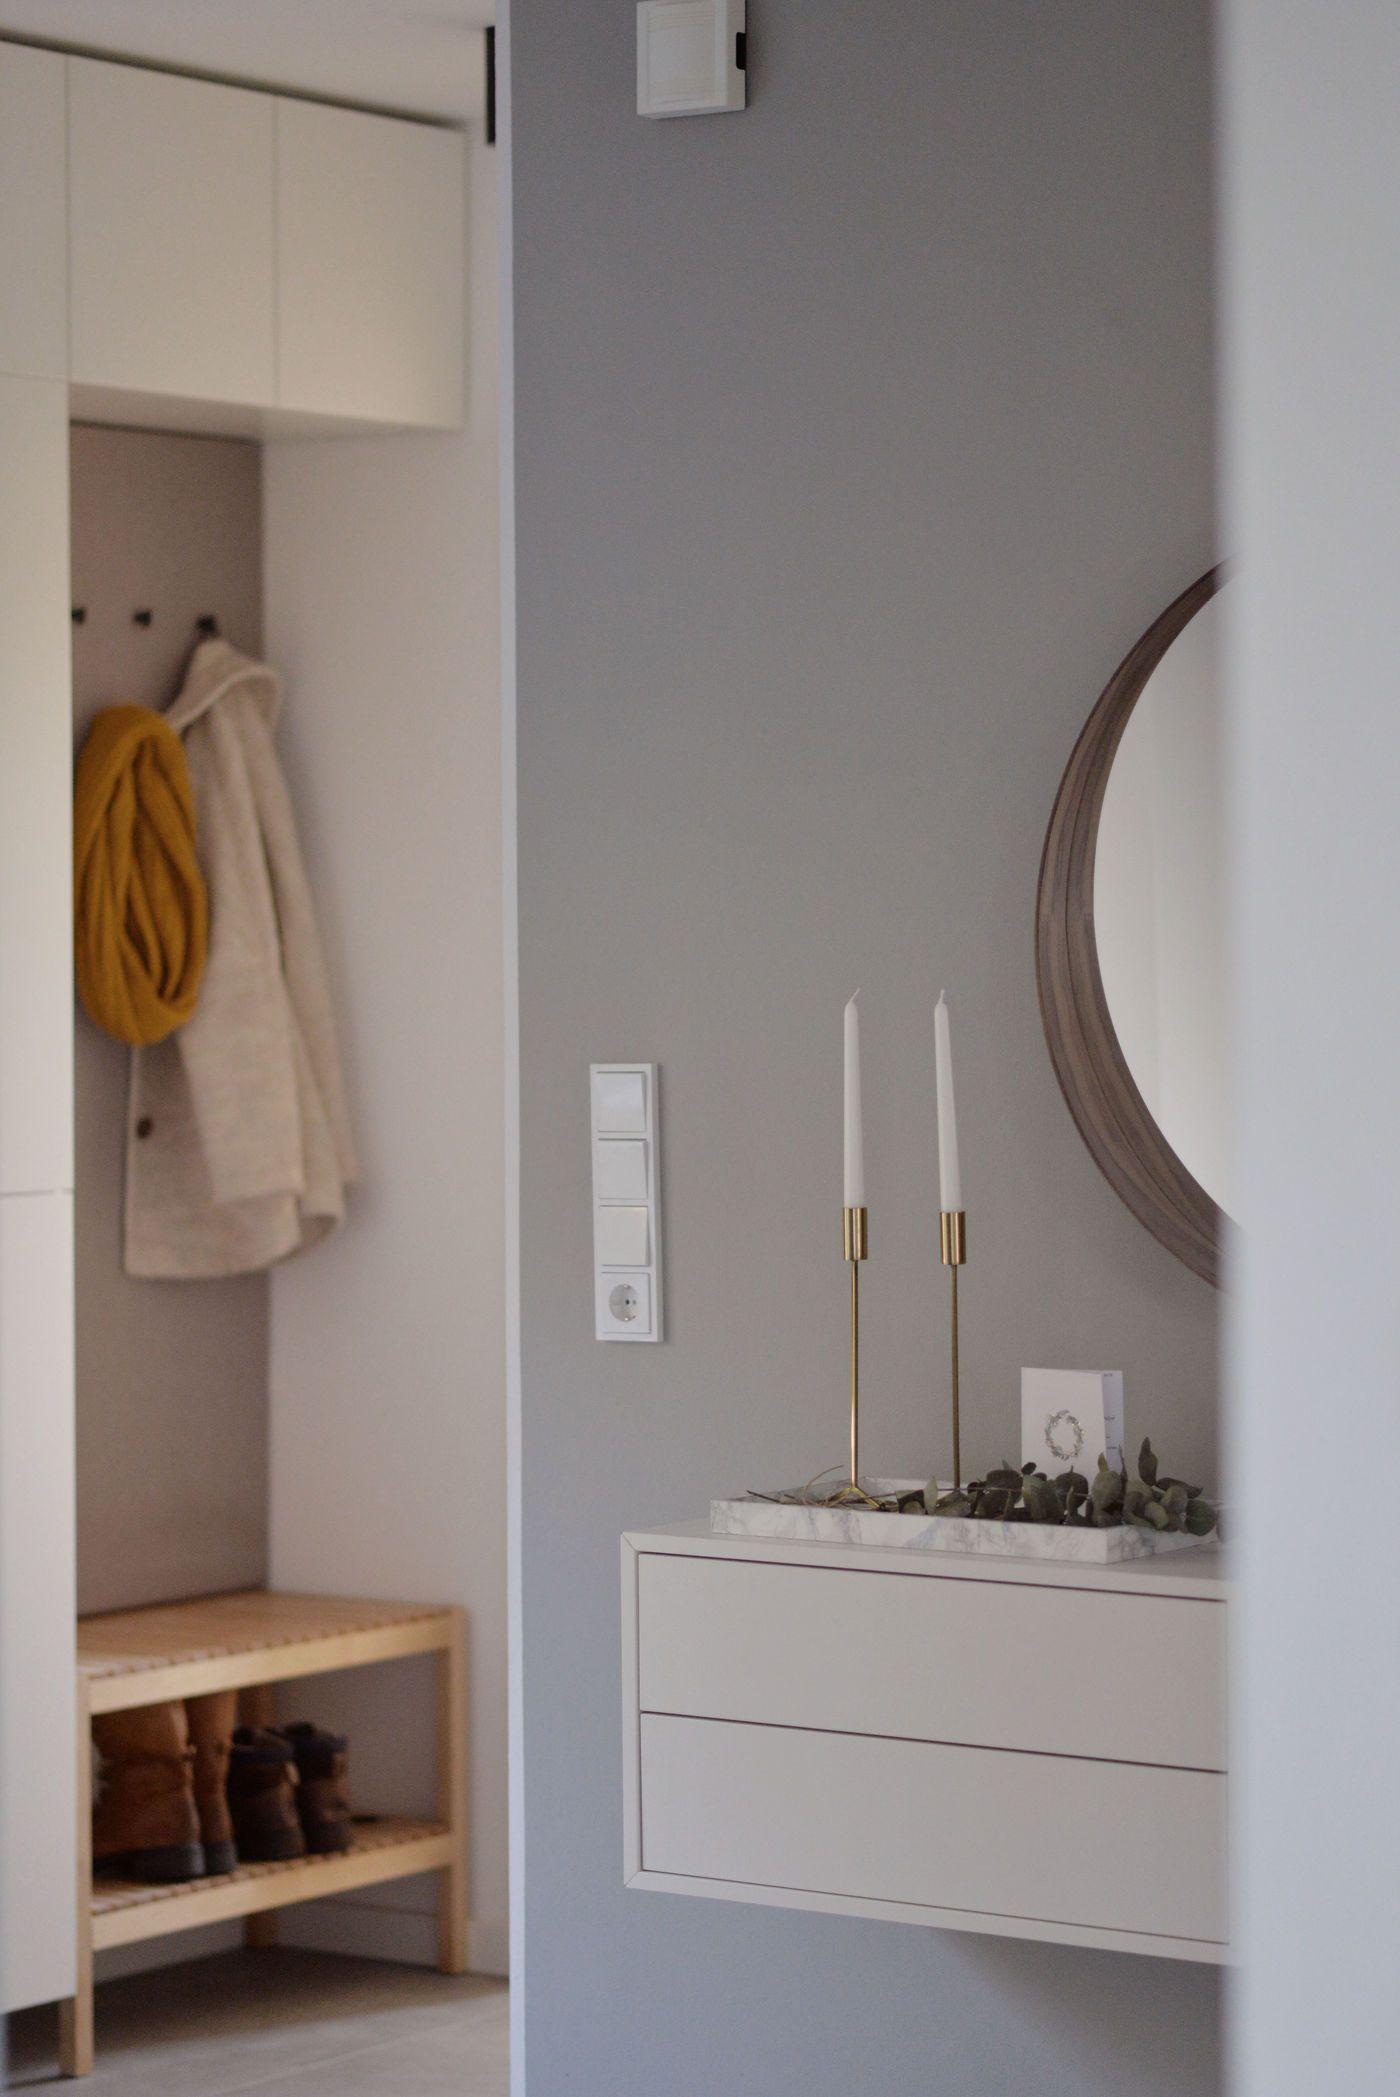 Full Size of Besten Ideen Fr Ikea Hacks Küche Kosten Betten Bei Modulküche Mit Aufbewahrung Aufbewahrungssystem Aufbewahrungsbox Garten 160x200 Miniküche Bett Sofa Wohnzimmer Ikea Hacks Aufbewahrung